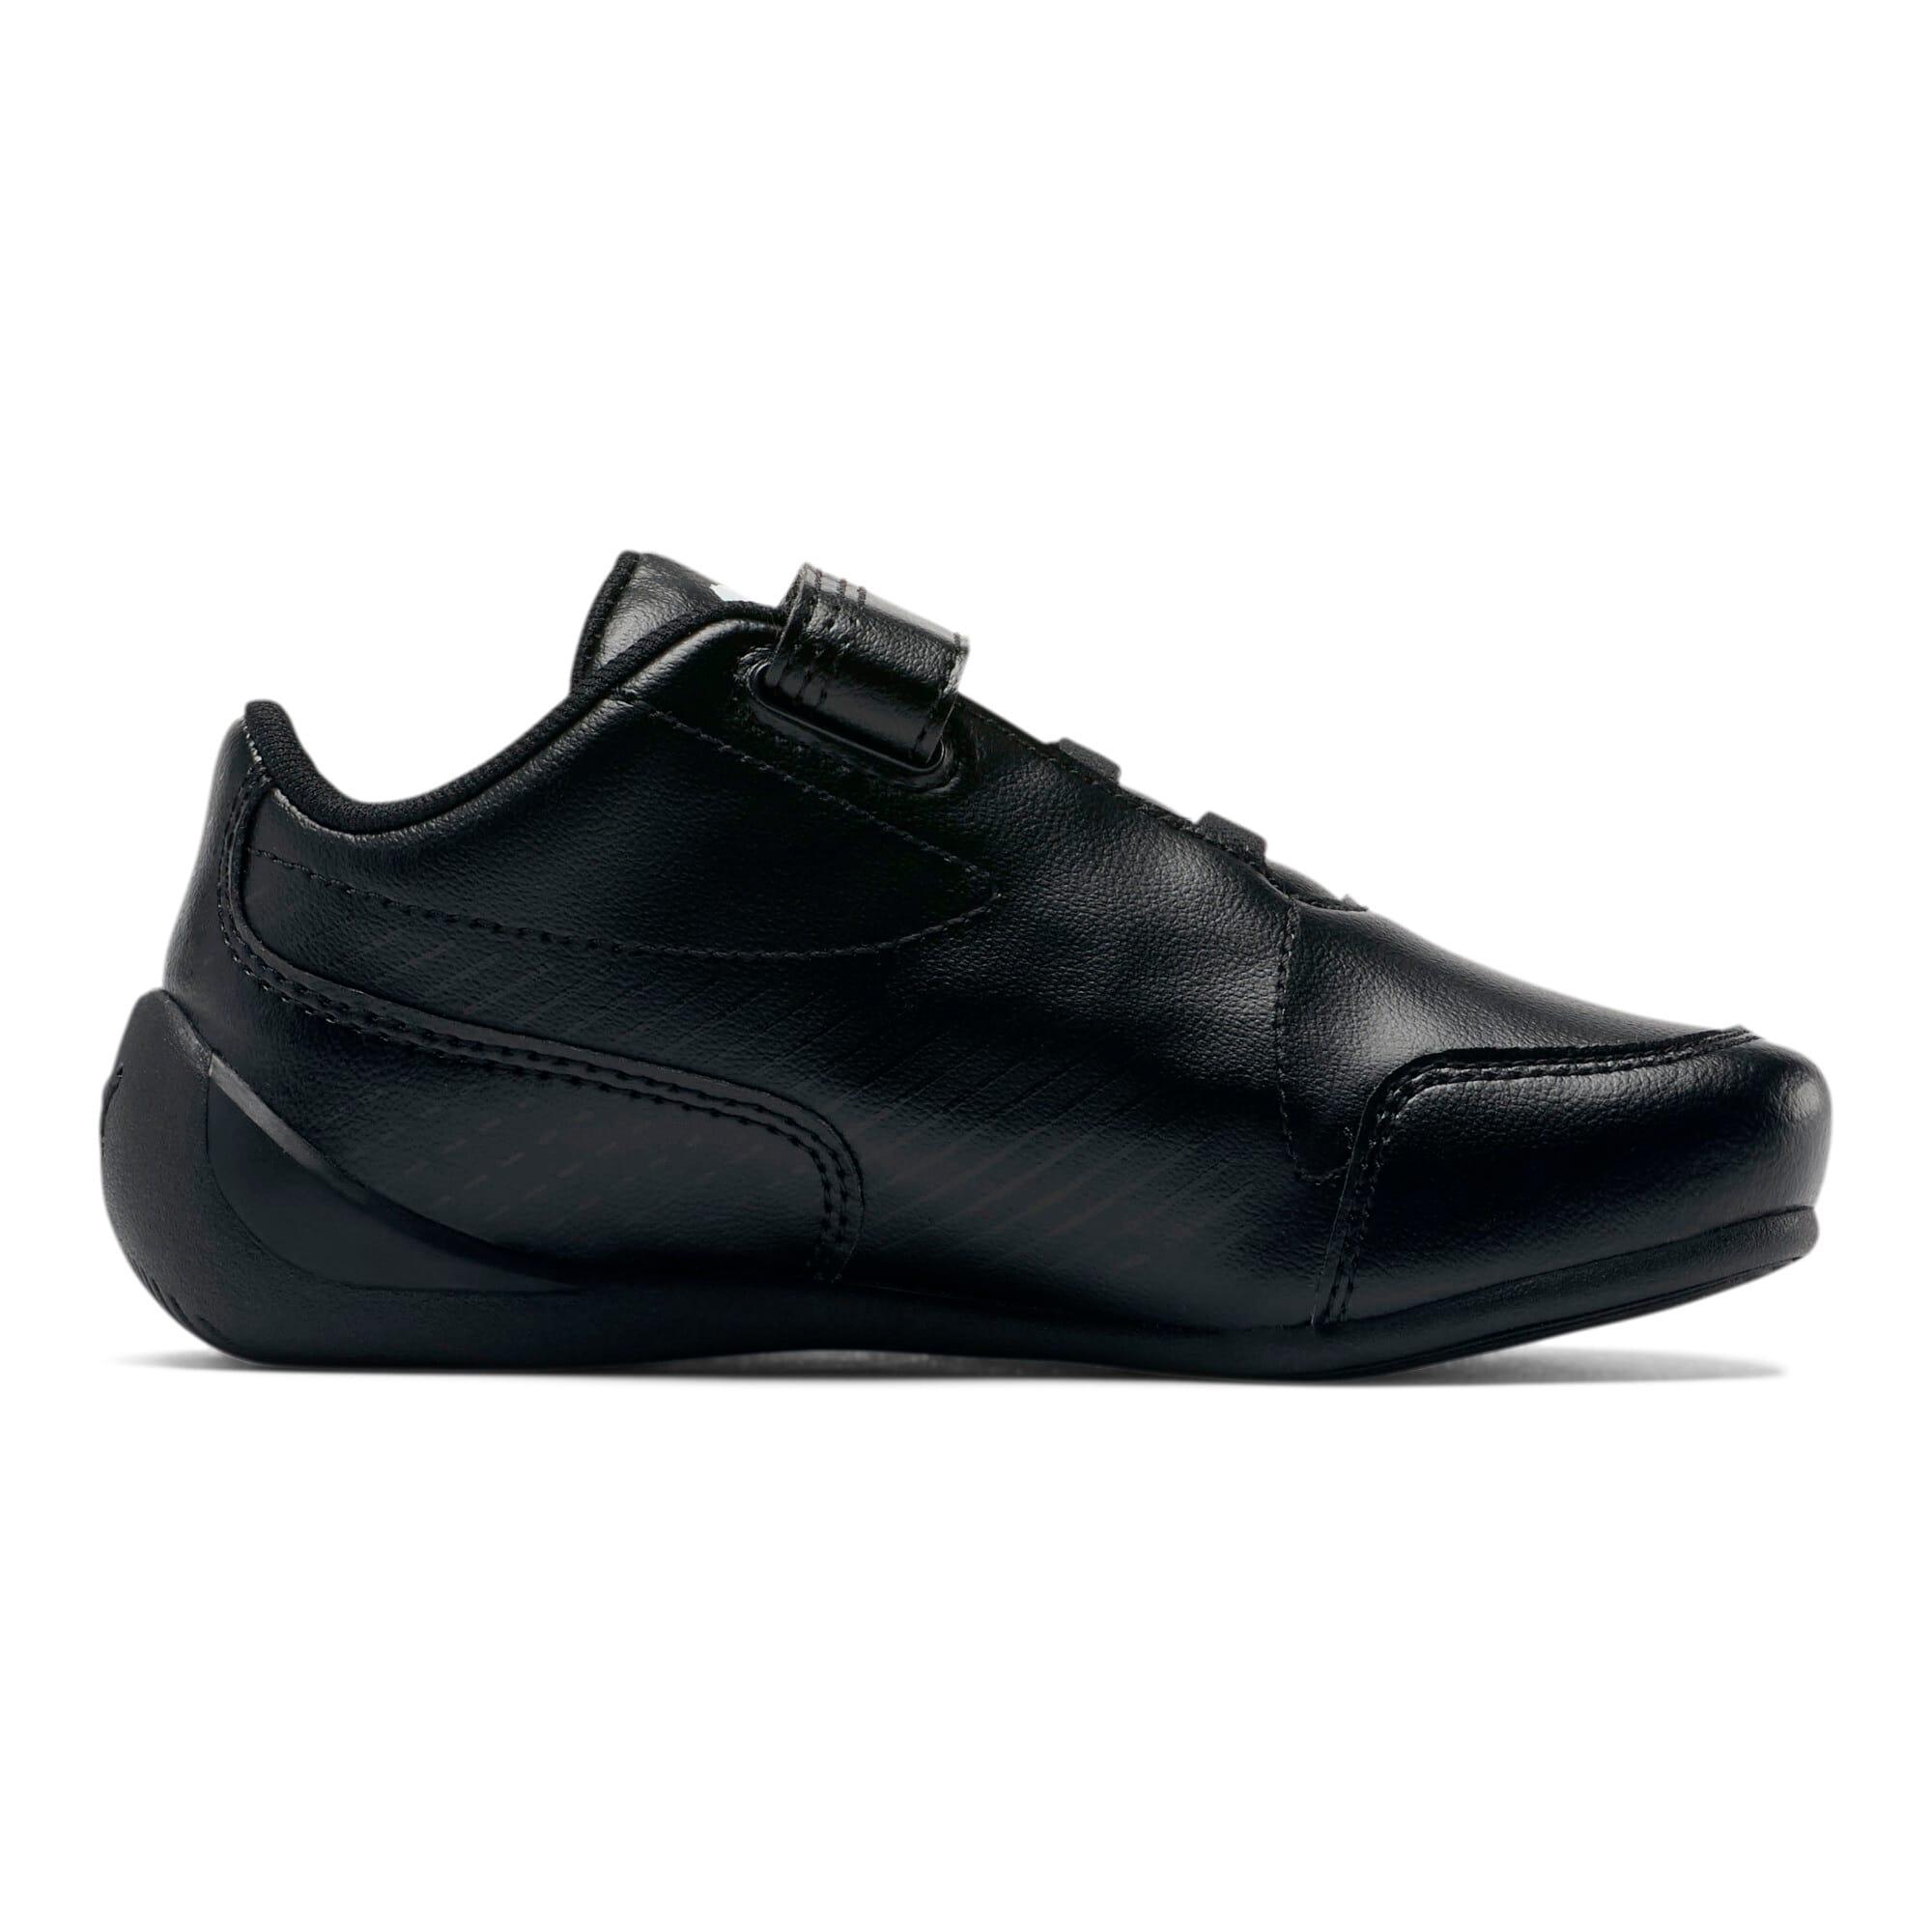 Thumbnail 5 of Drift Cat 7S Ultra Little Kids' Shoes, Puma Black-Puma Black, medium